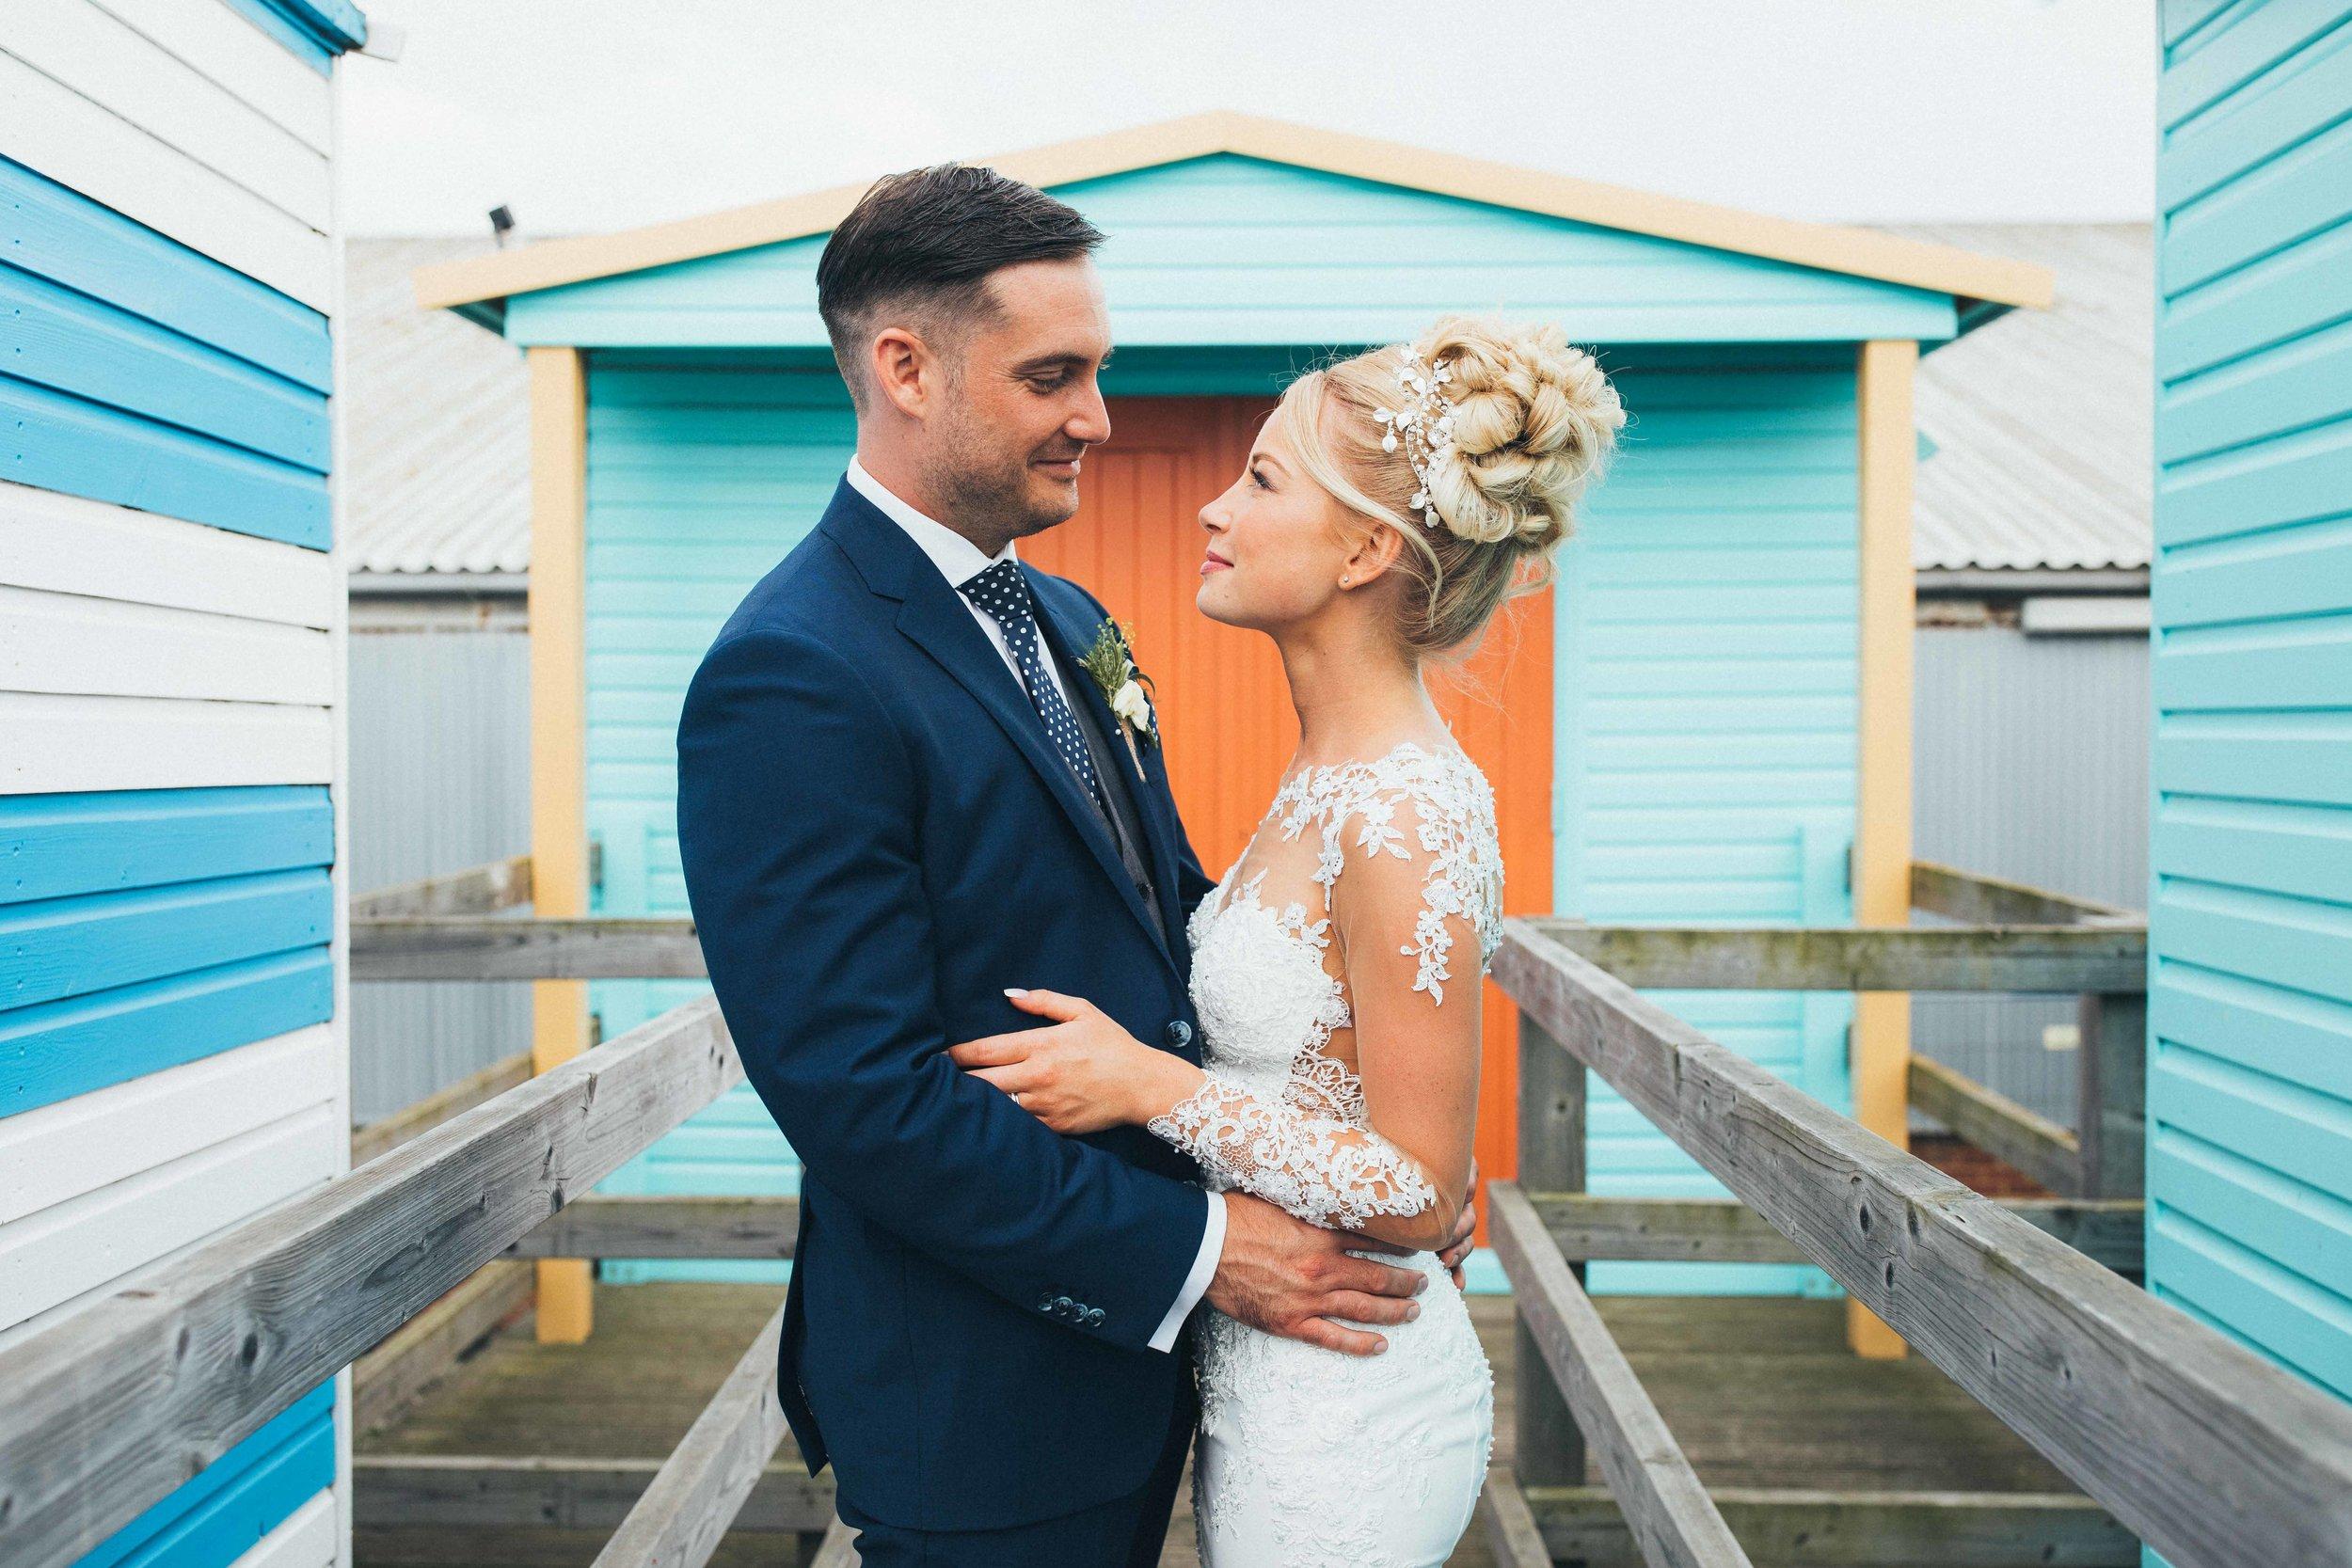 Chloe & Matt - East Quay Wedding Venue - Whitstable